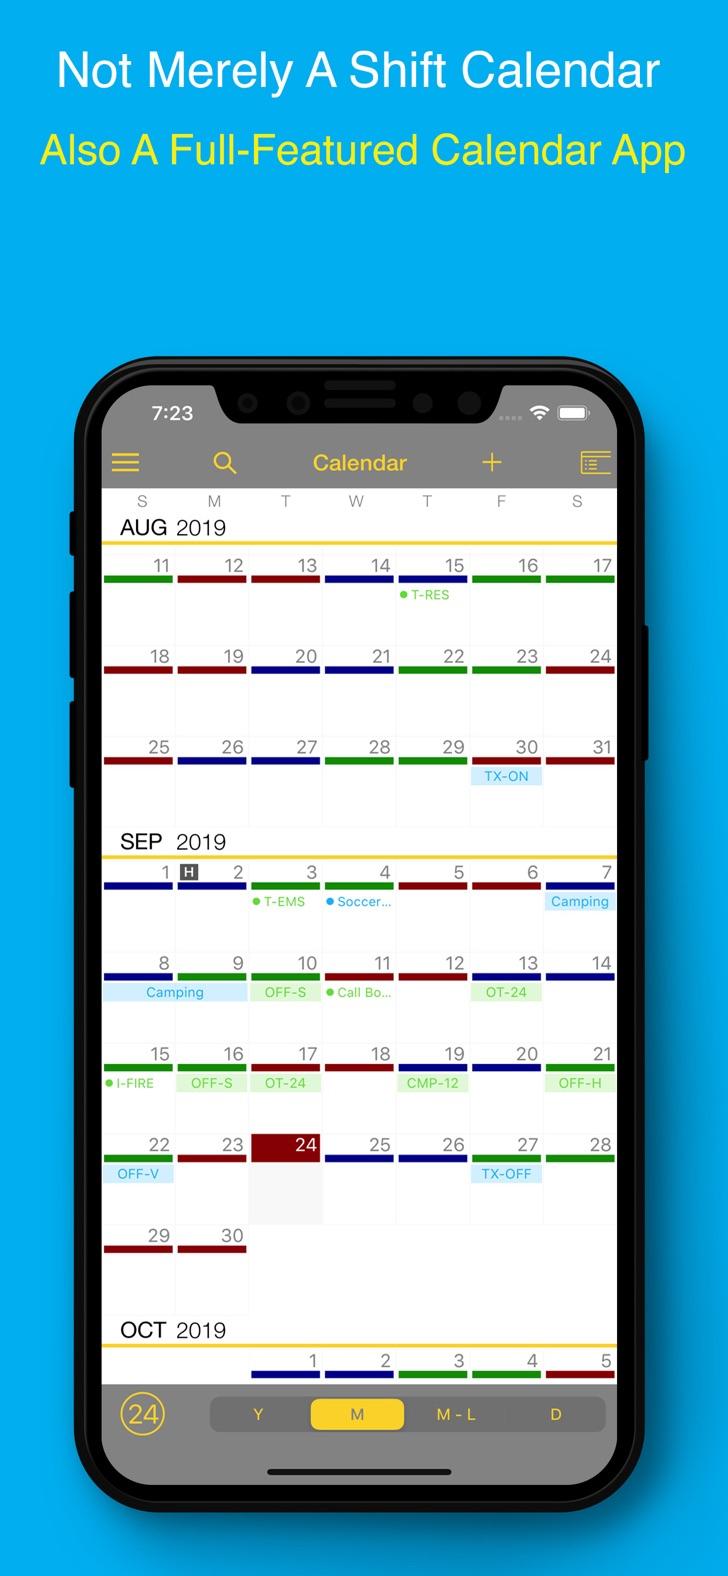 Firesync Shift Calendar 4.0.1 - Free Productivity App For intended for Firehouse Shift Calendar